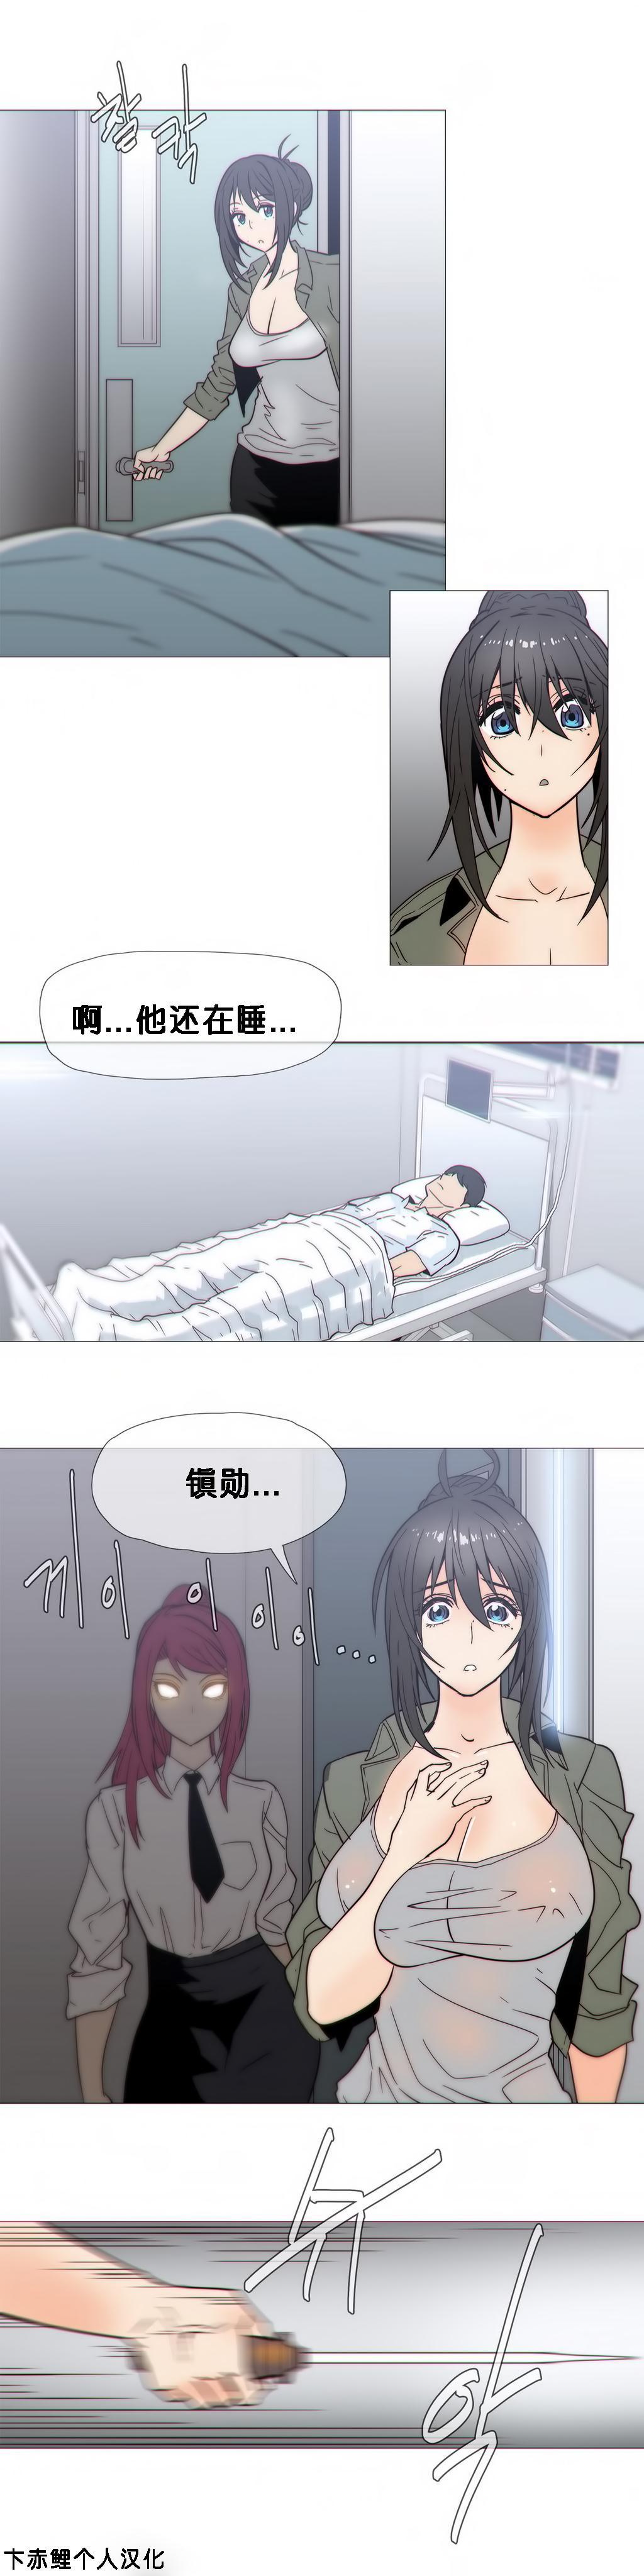 HouseHold Affairs 【卞赤鲤个人汉化】1~21话(持续更新中) 490